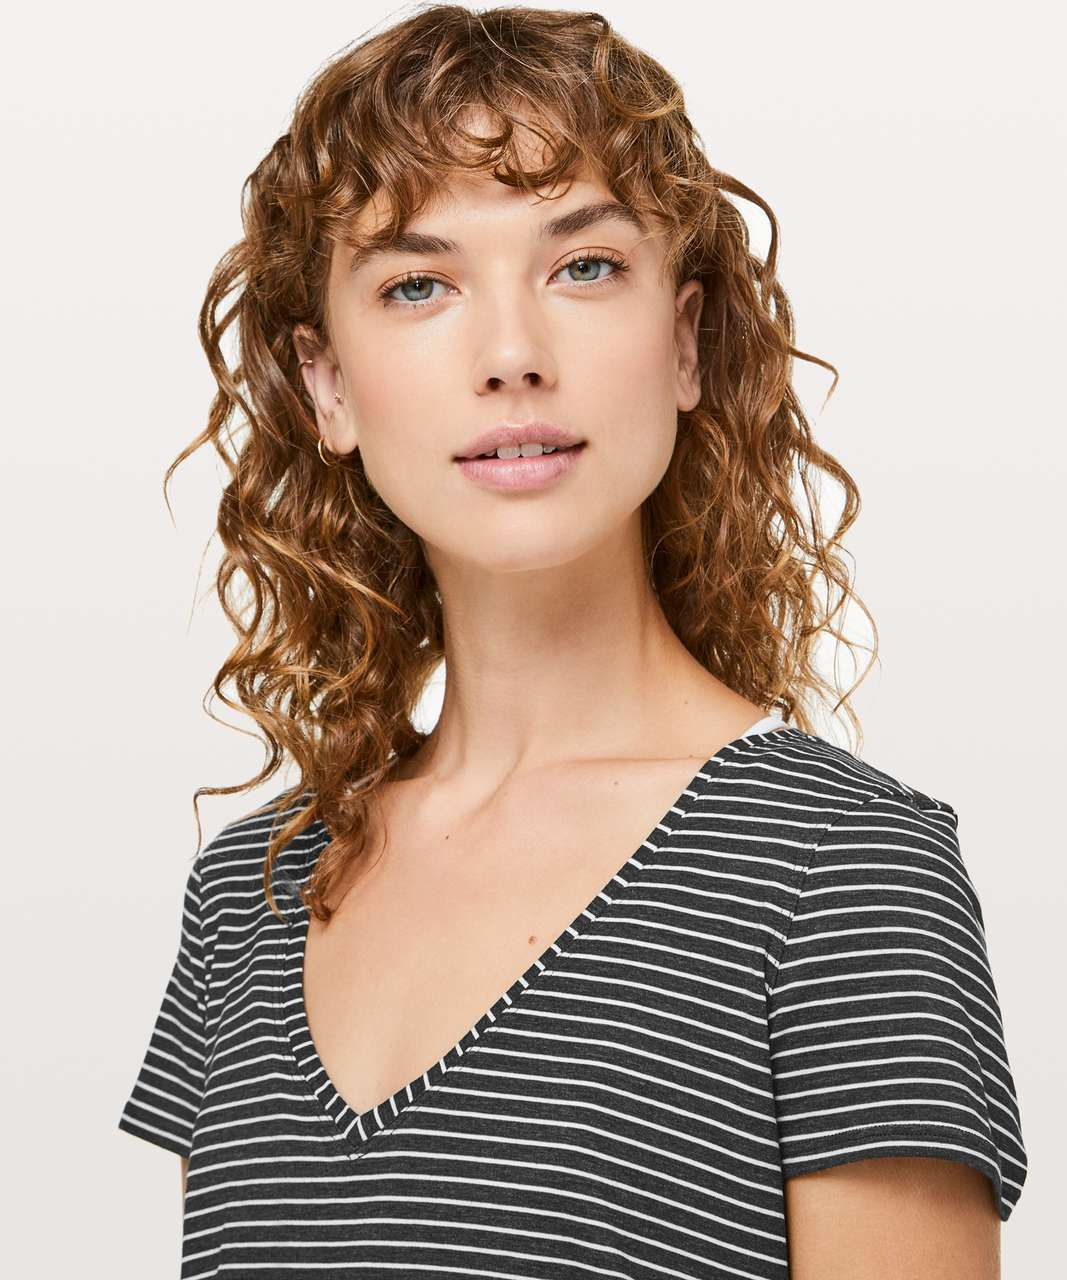 Lululemon Love Tee V - Modern Stripe Heathered Black White